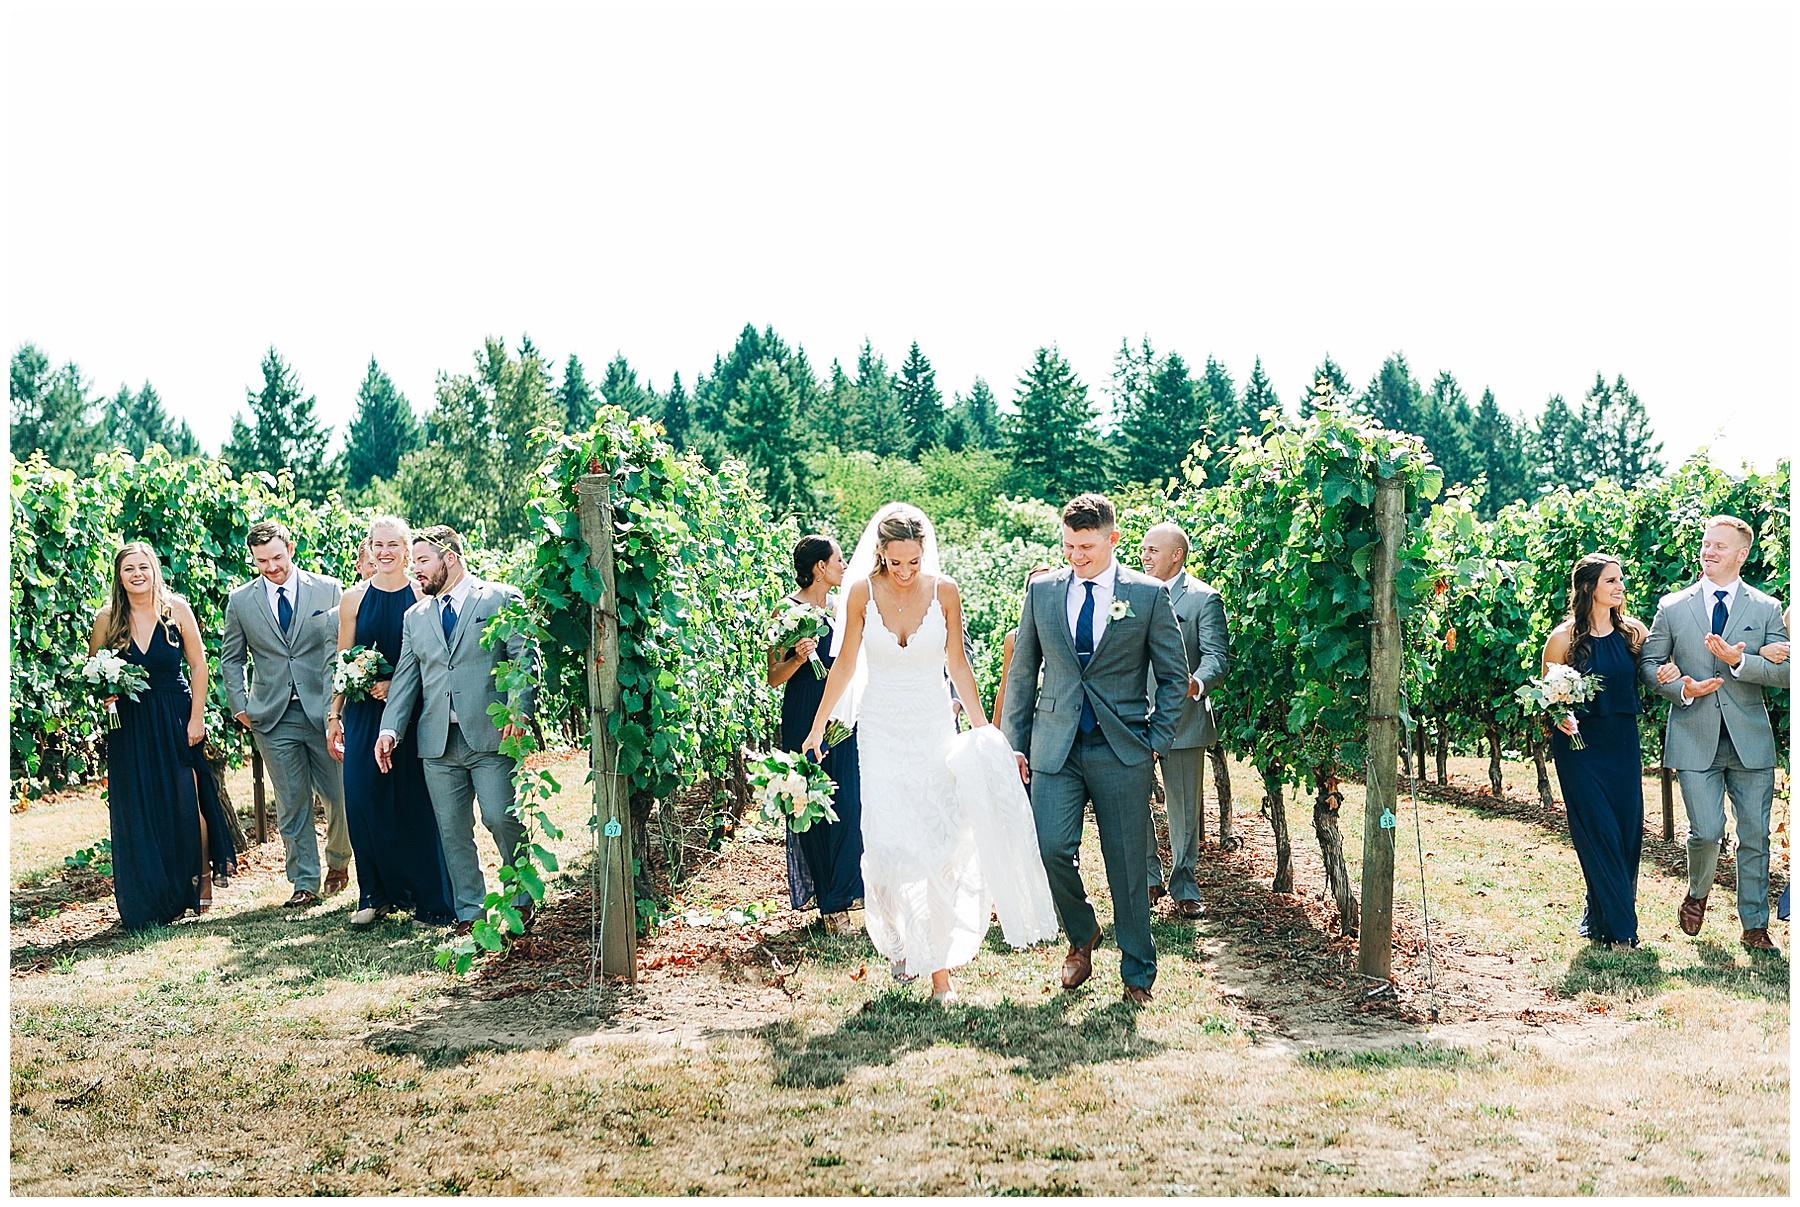 fine art wedding photographer,Oswego Hills Winery,lake oswego oregon, Tylyn & Tate Fine Art Wedding Photographer Oswego Hills Winery Lake Oswego Oregon, Fine Art Wedding Photographer Portland, Oregon, Fine Art Wedding Photographer Portland, Oregon